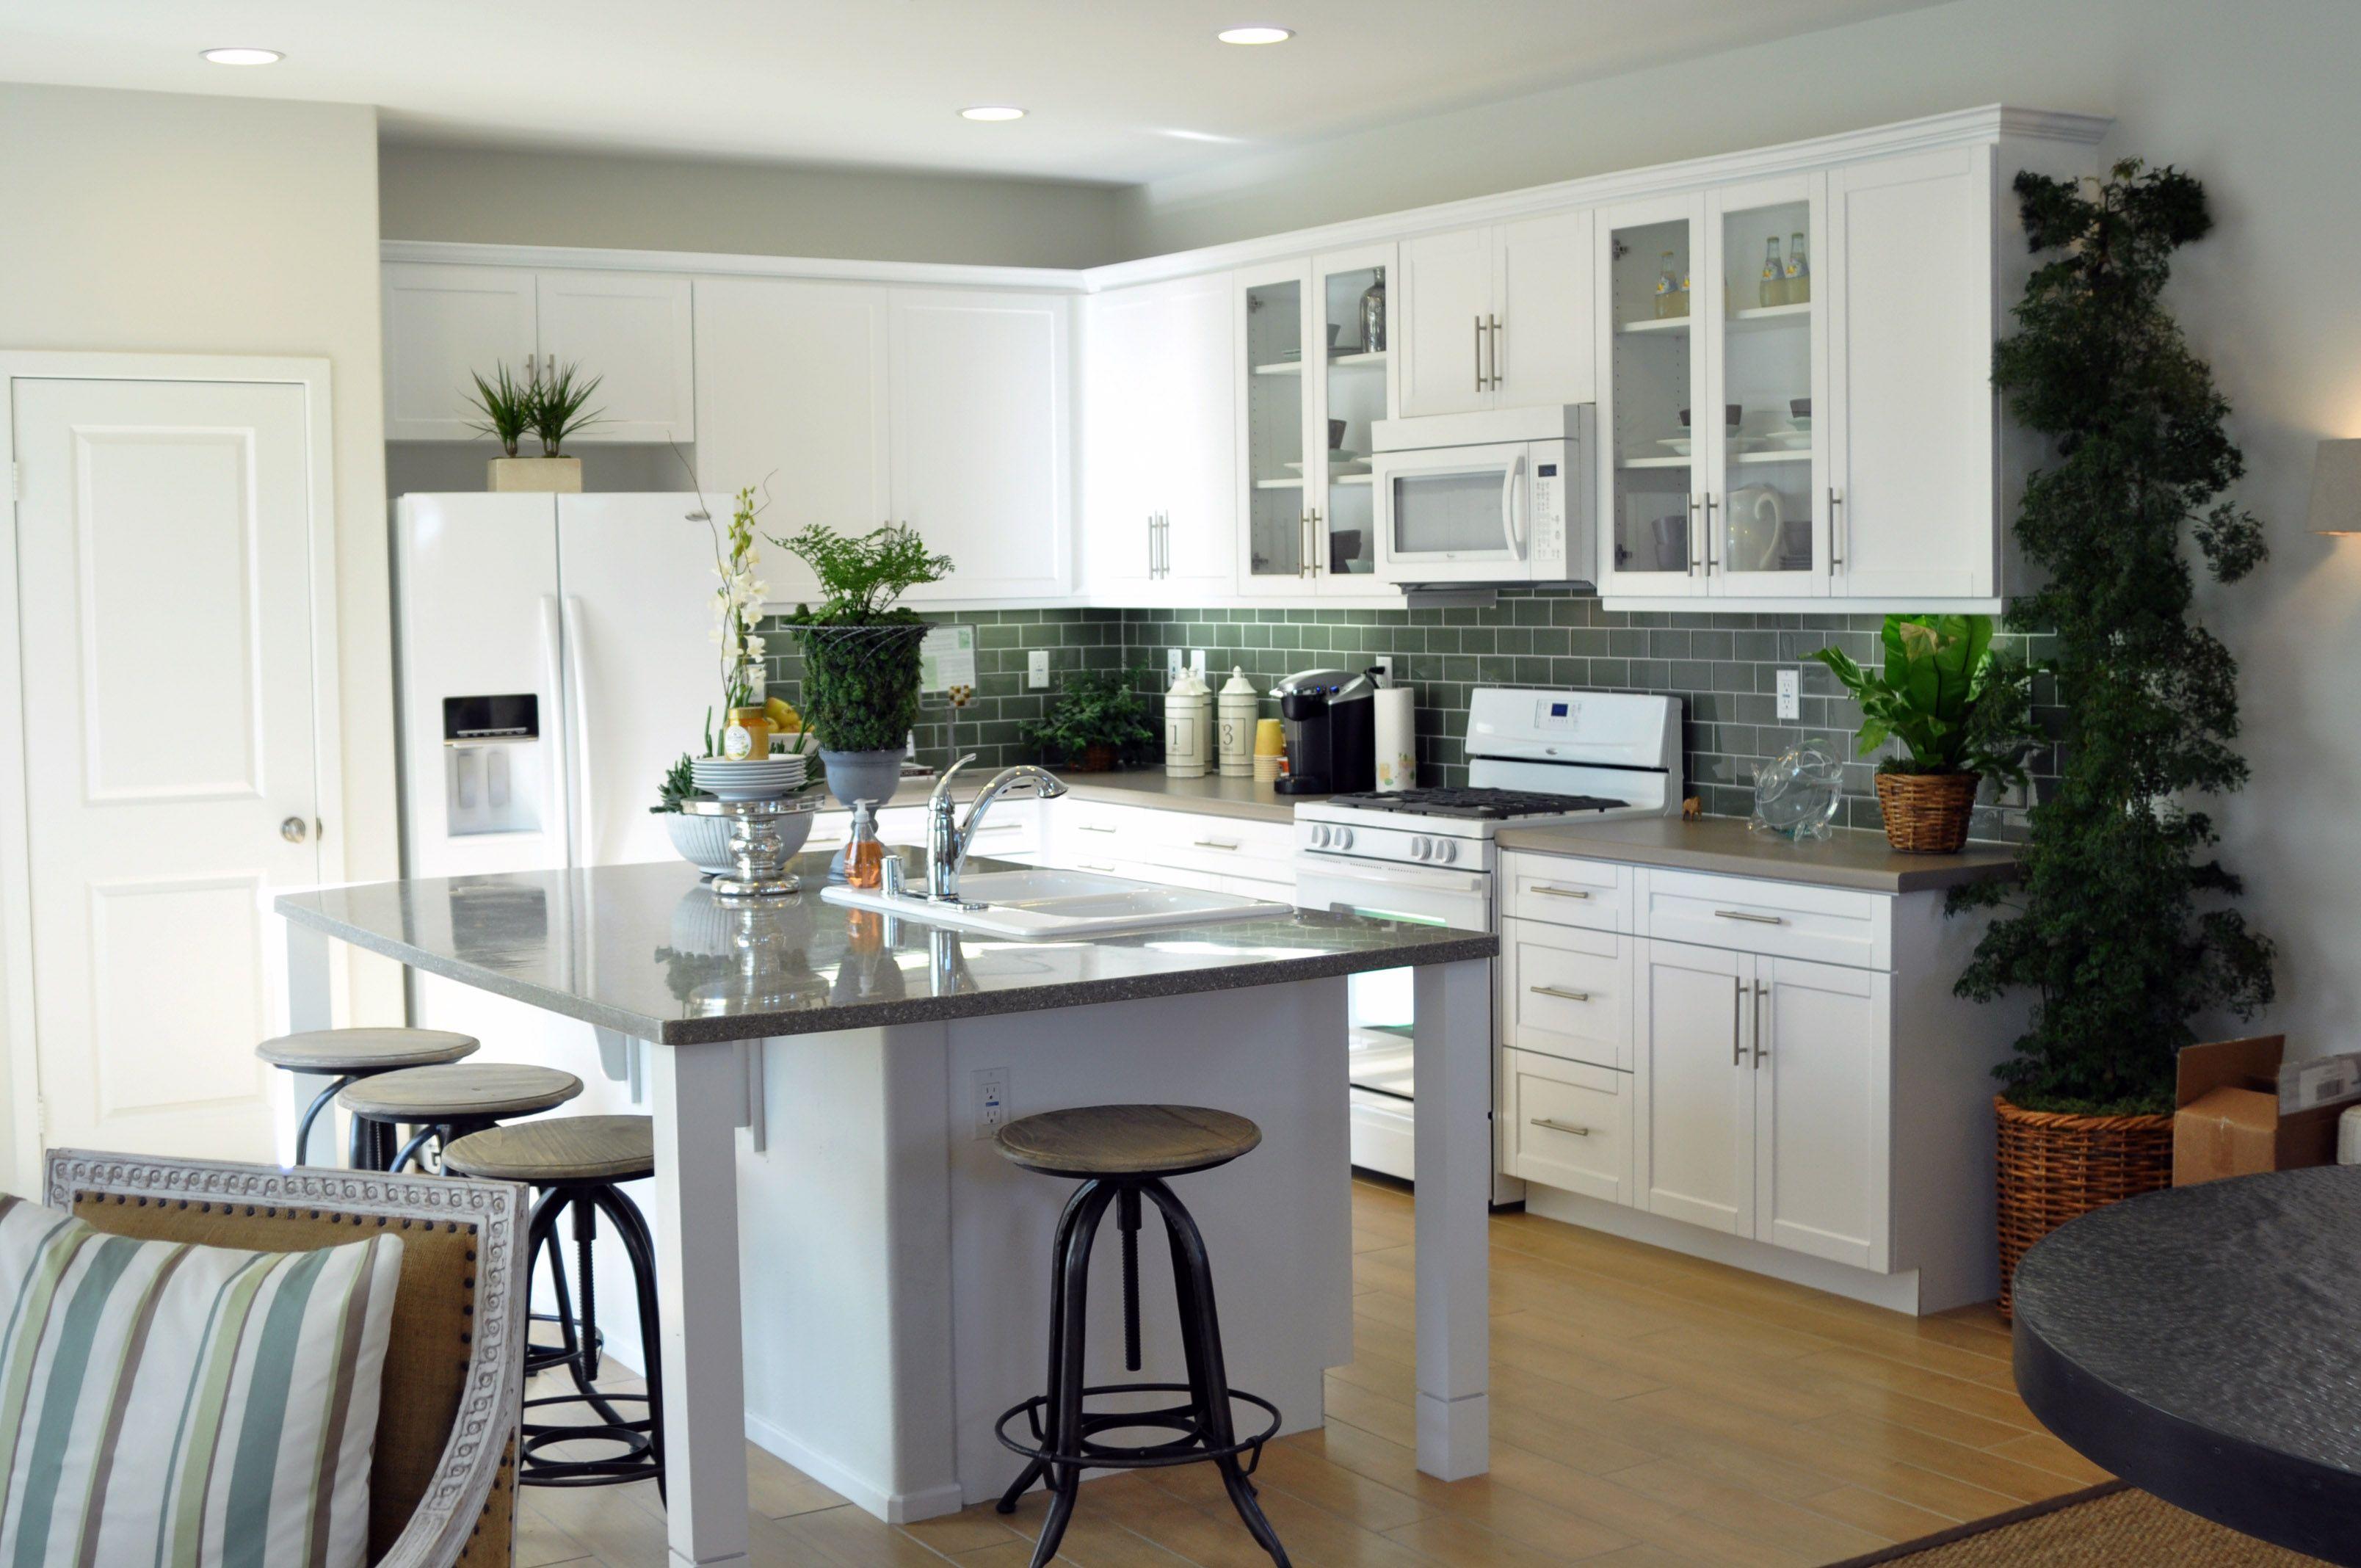 Green Door In Shaker White Rtf Kitchens And Baths By Lynn In California Is A Dealer For Rsi 760 5 Kitchen Plans Modern Kitchen Design Craftsman Kitchen White